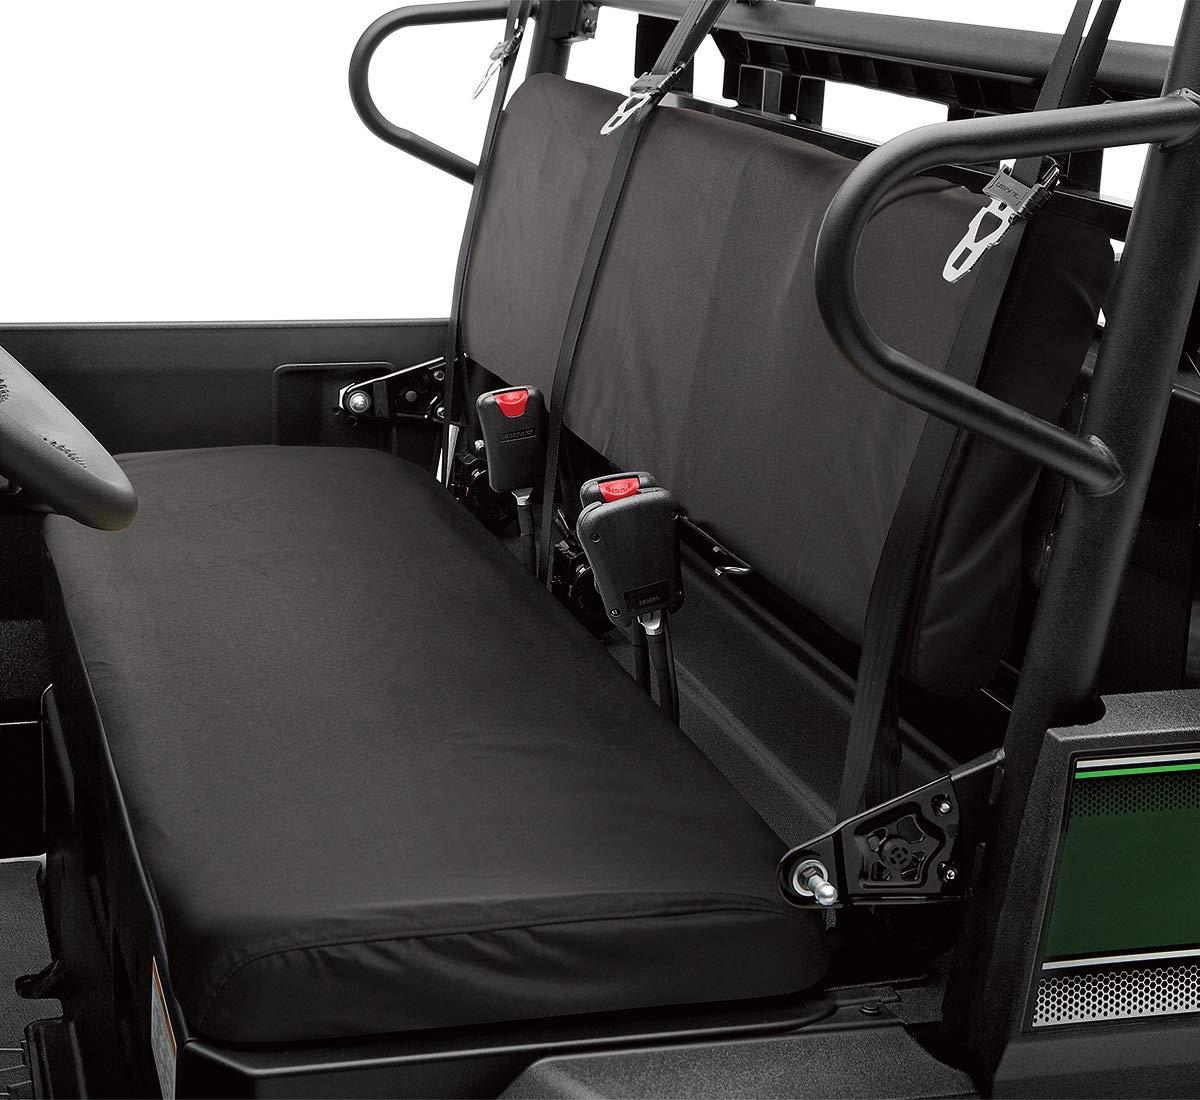 2015-2018 Kawasaki Mule PRO-FXT DXT FX DX Black Seat Cover 99994-1151